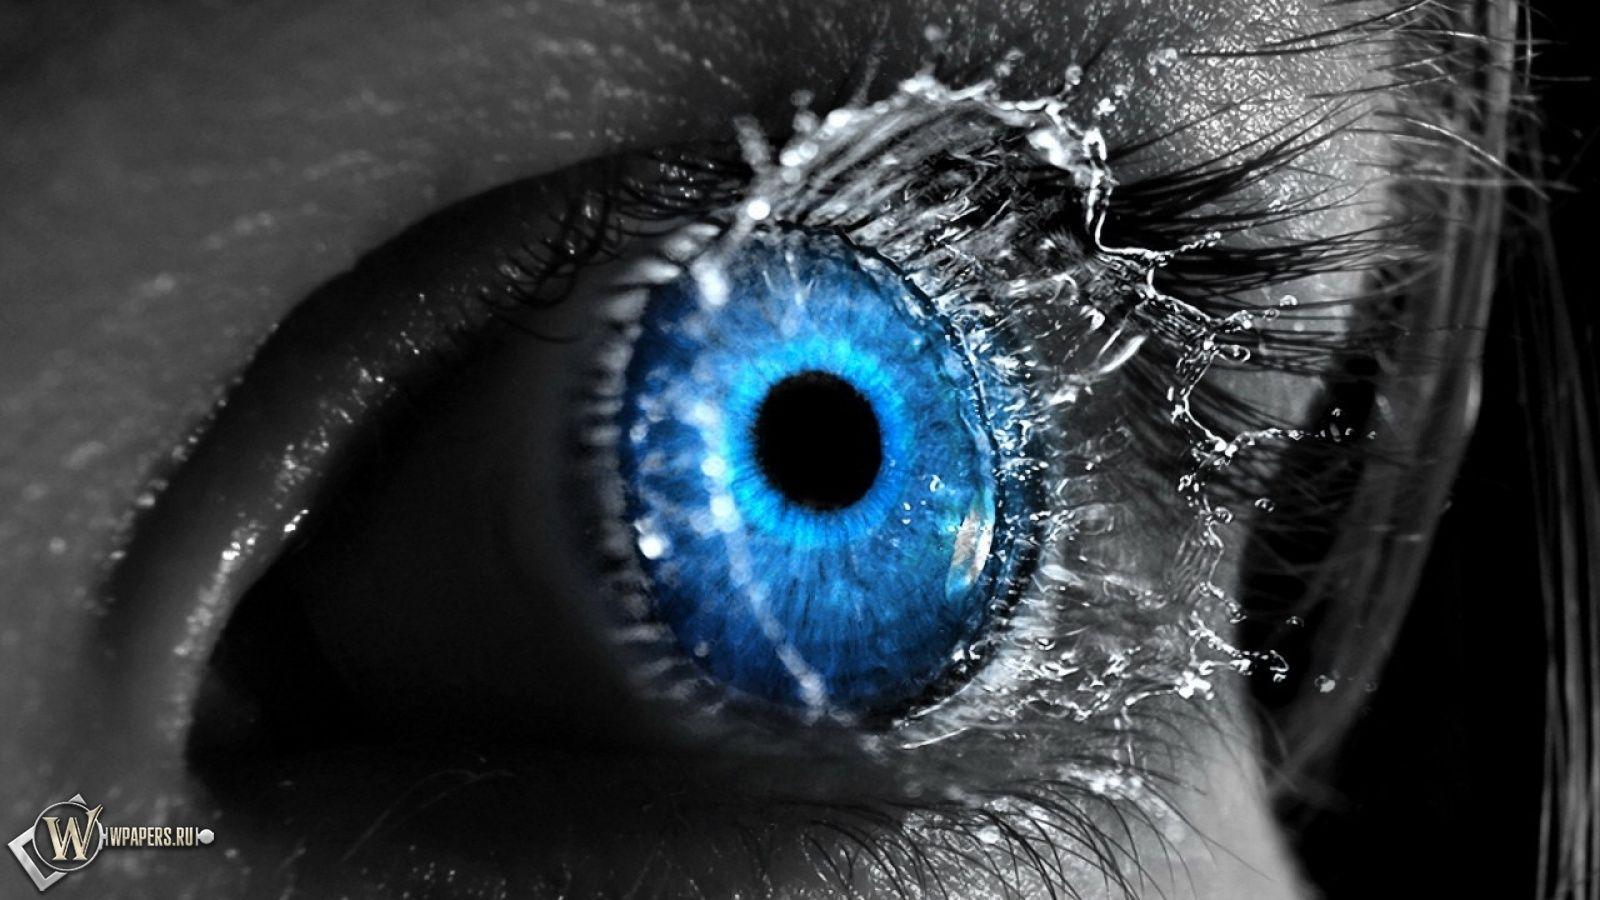 Blue Eye Abstract Wallpaper Hd Best Of Hd Wallpaper Collections Eyes Wallpaper Water Artwork Eye Art